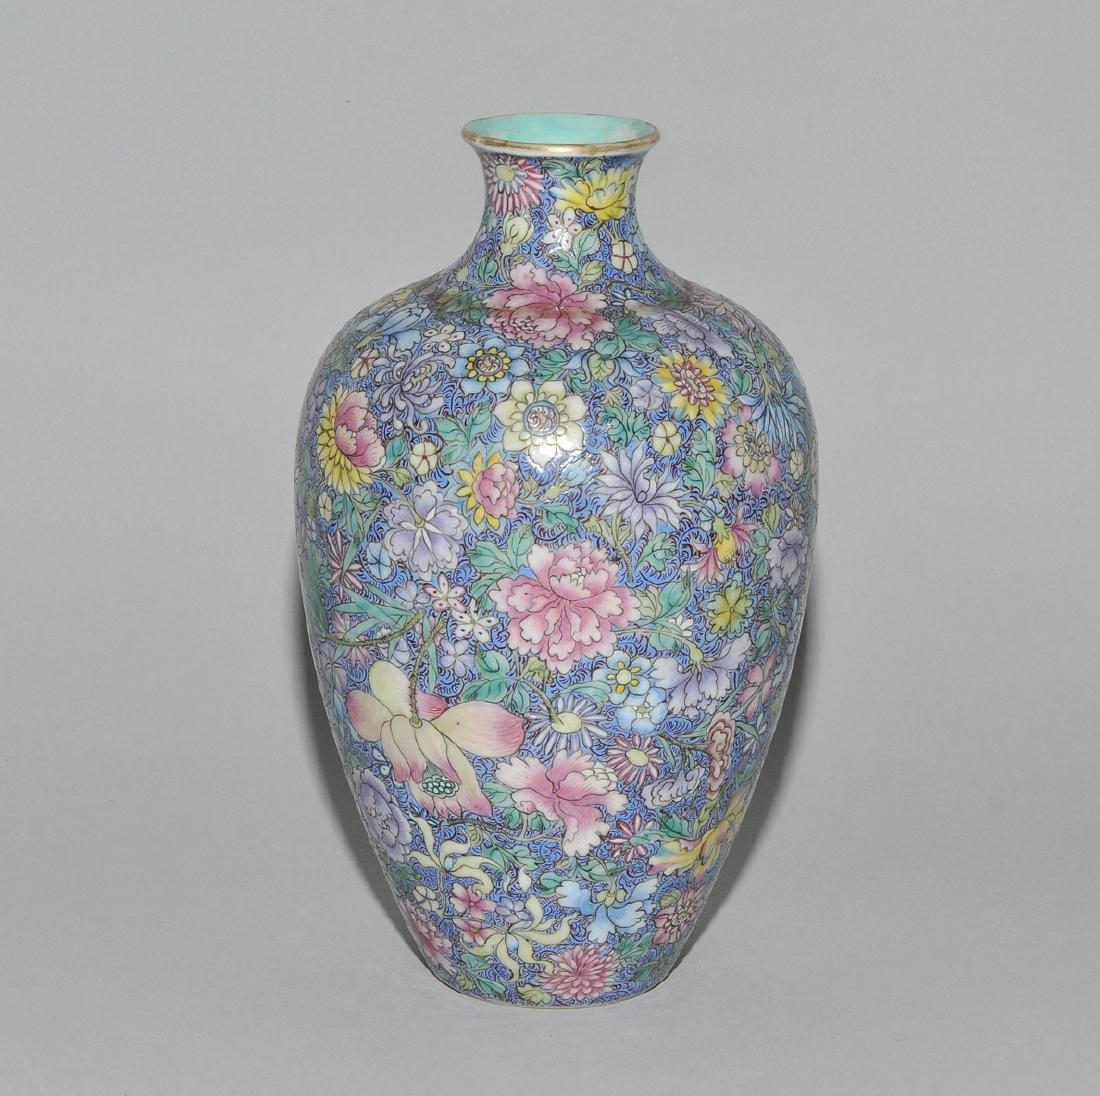 Vase China, 1.Hälfte 20.Jh. Porzellan. Eisenrote - 5